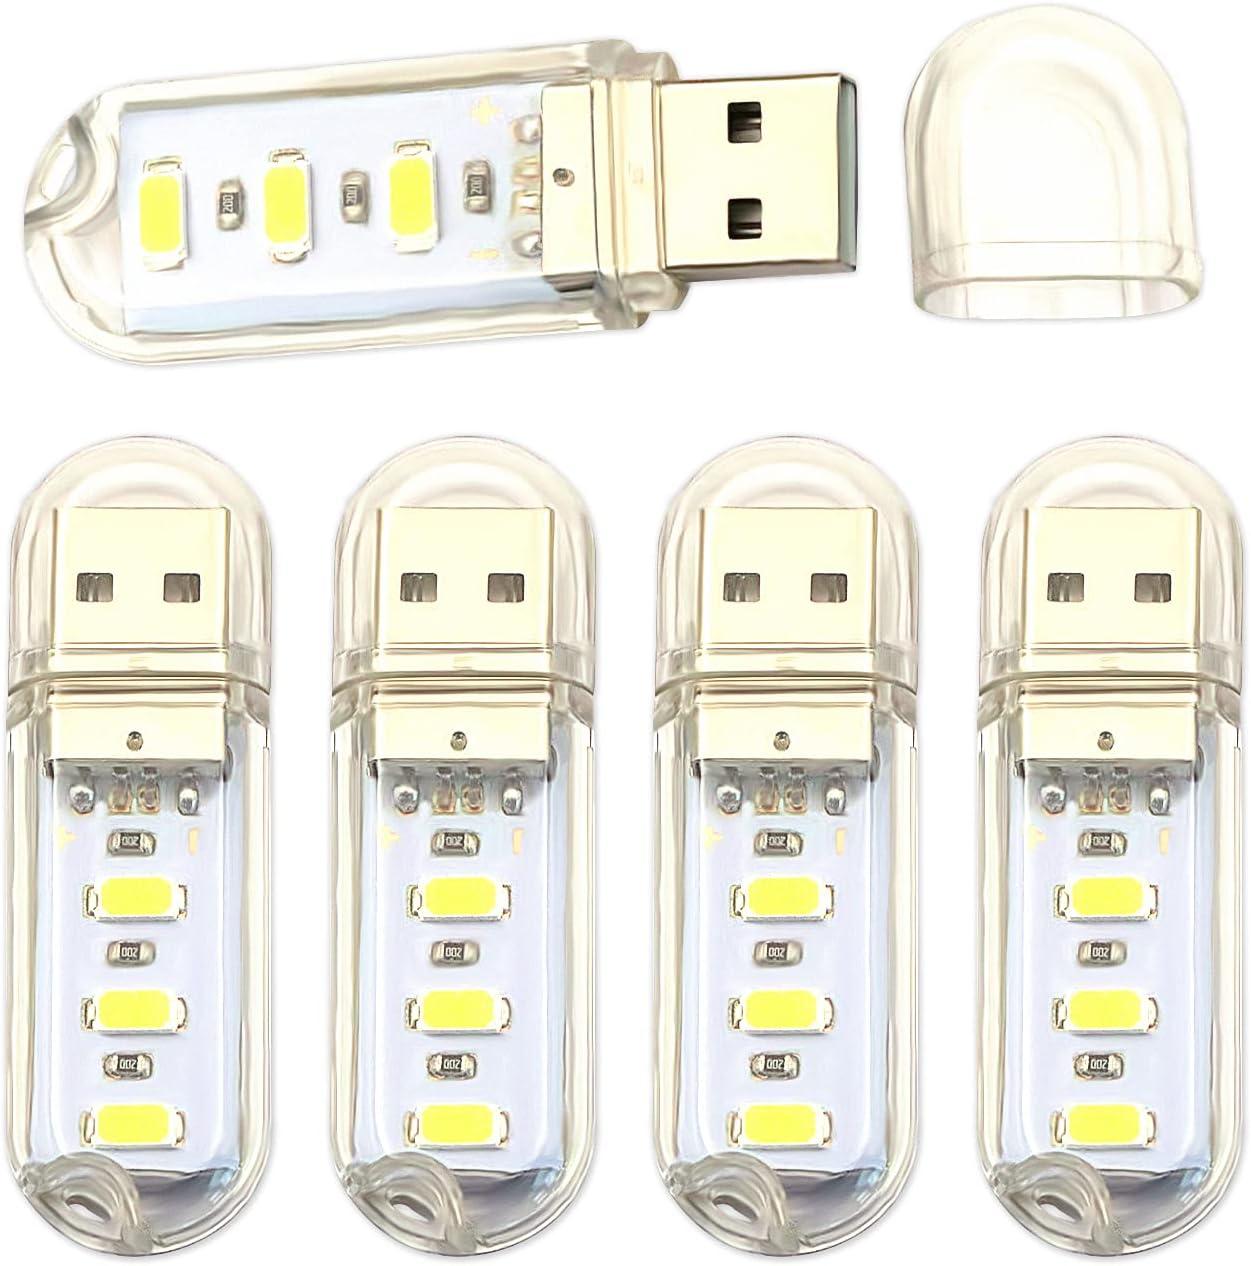 V Telesky 5 Pack USB Reading Light,LED Protable Night Light ,USB Shape 3 LED Light